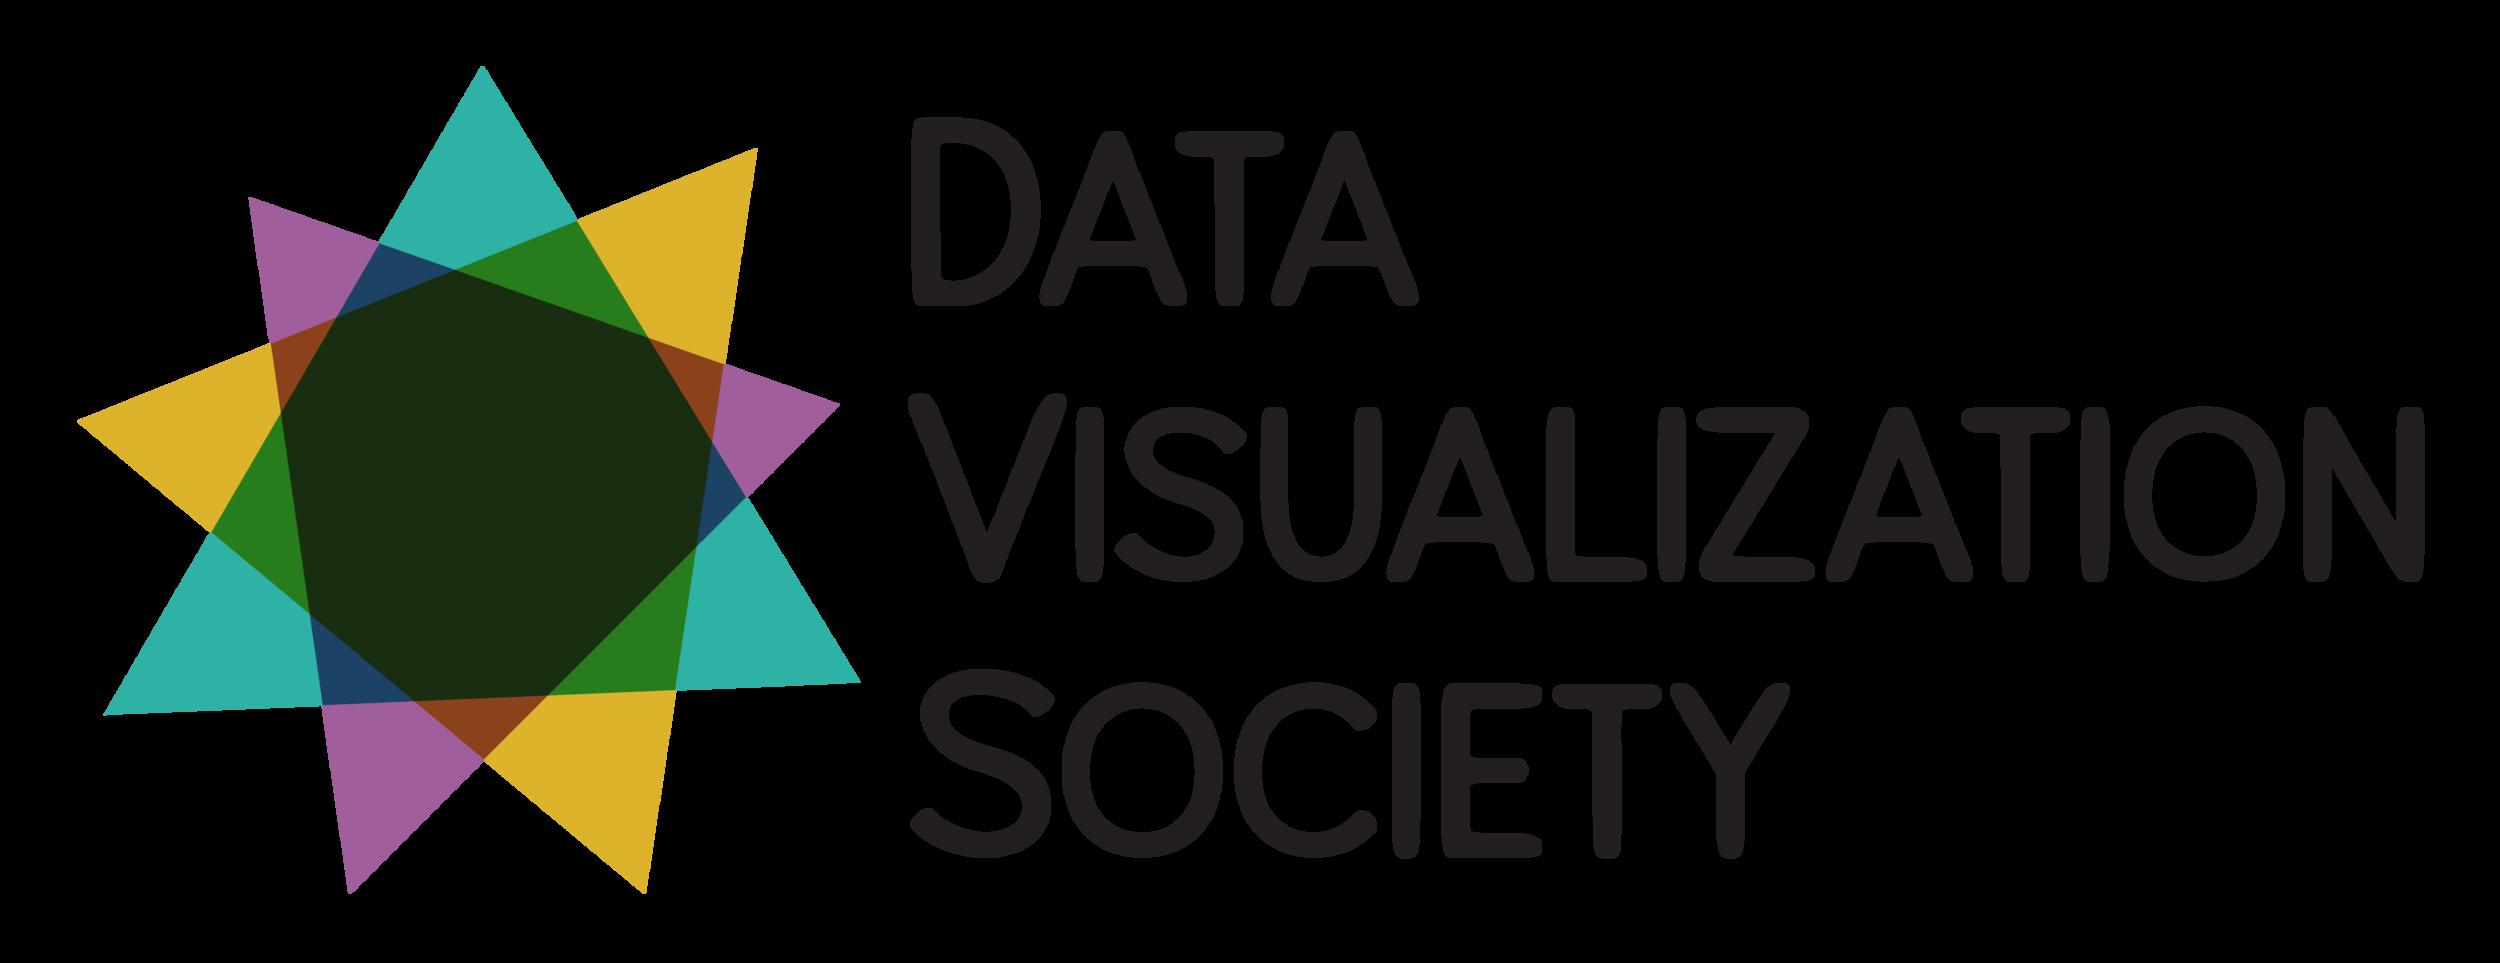 Data Visualization Society main logo